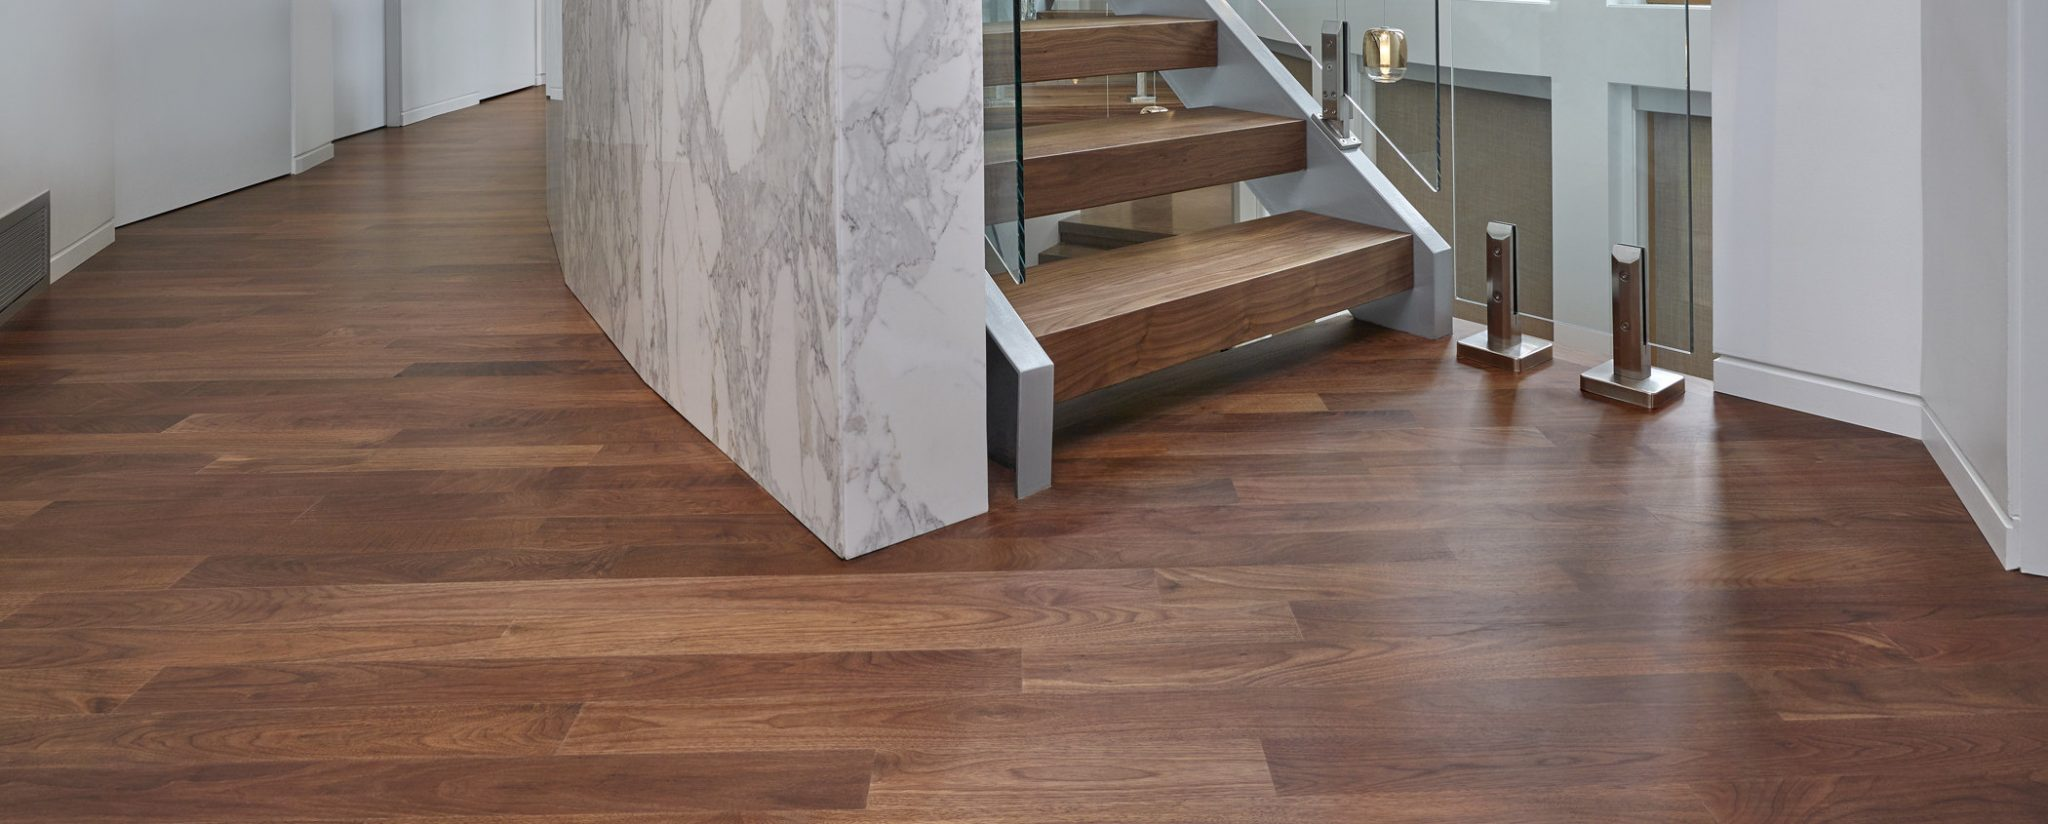 Touchwood Flooring